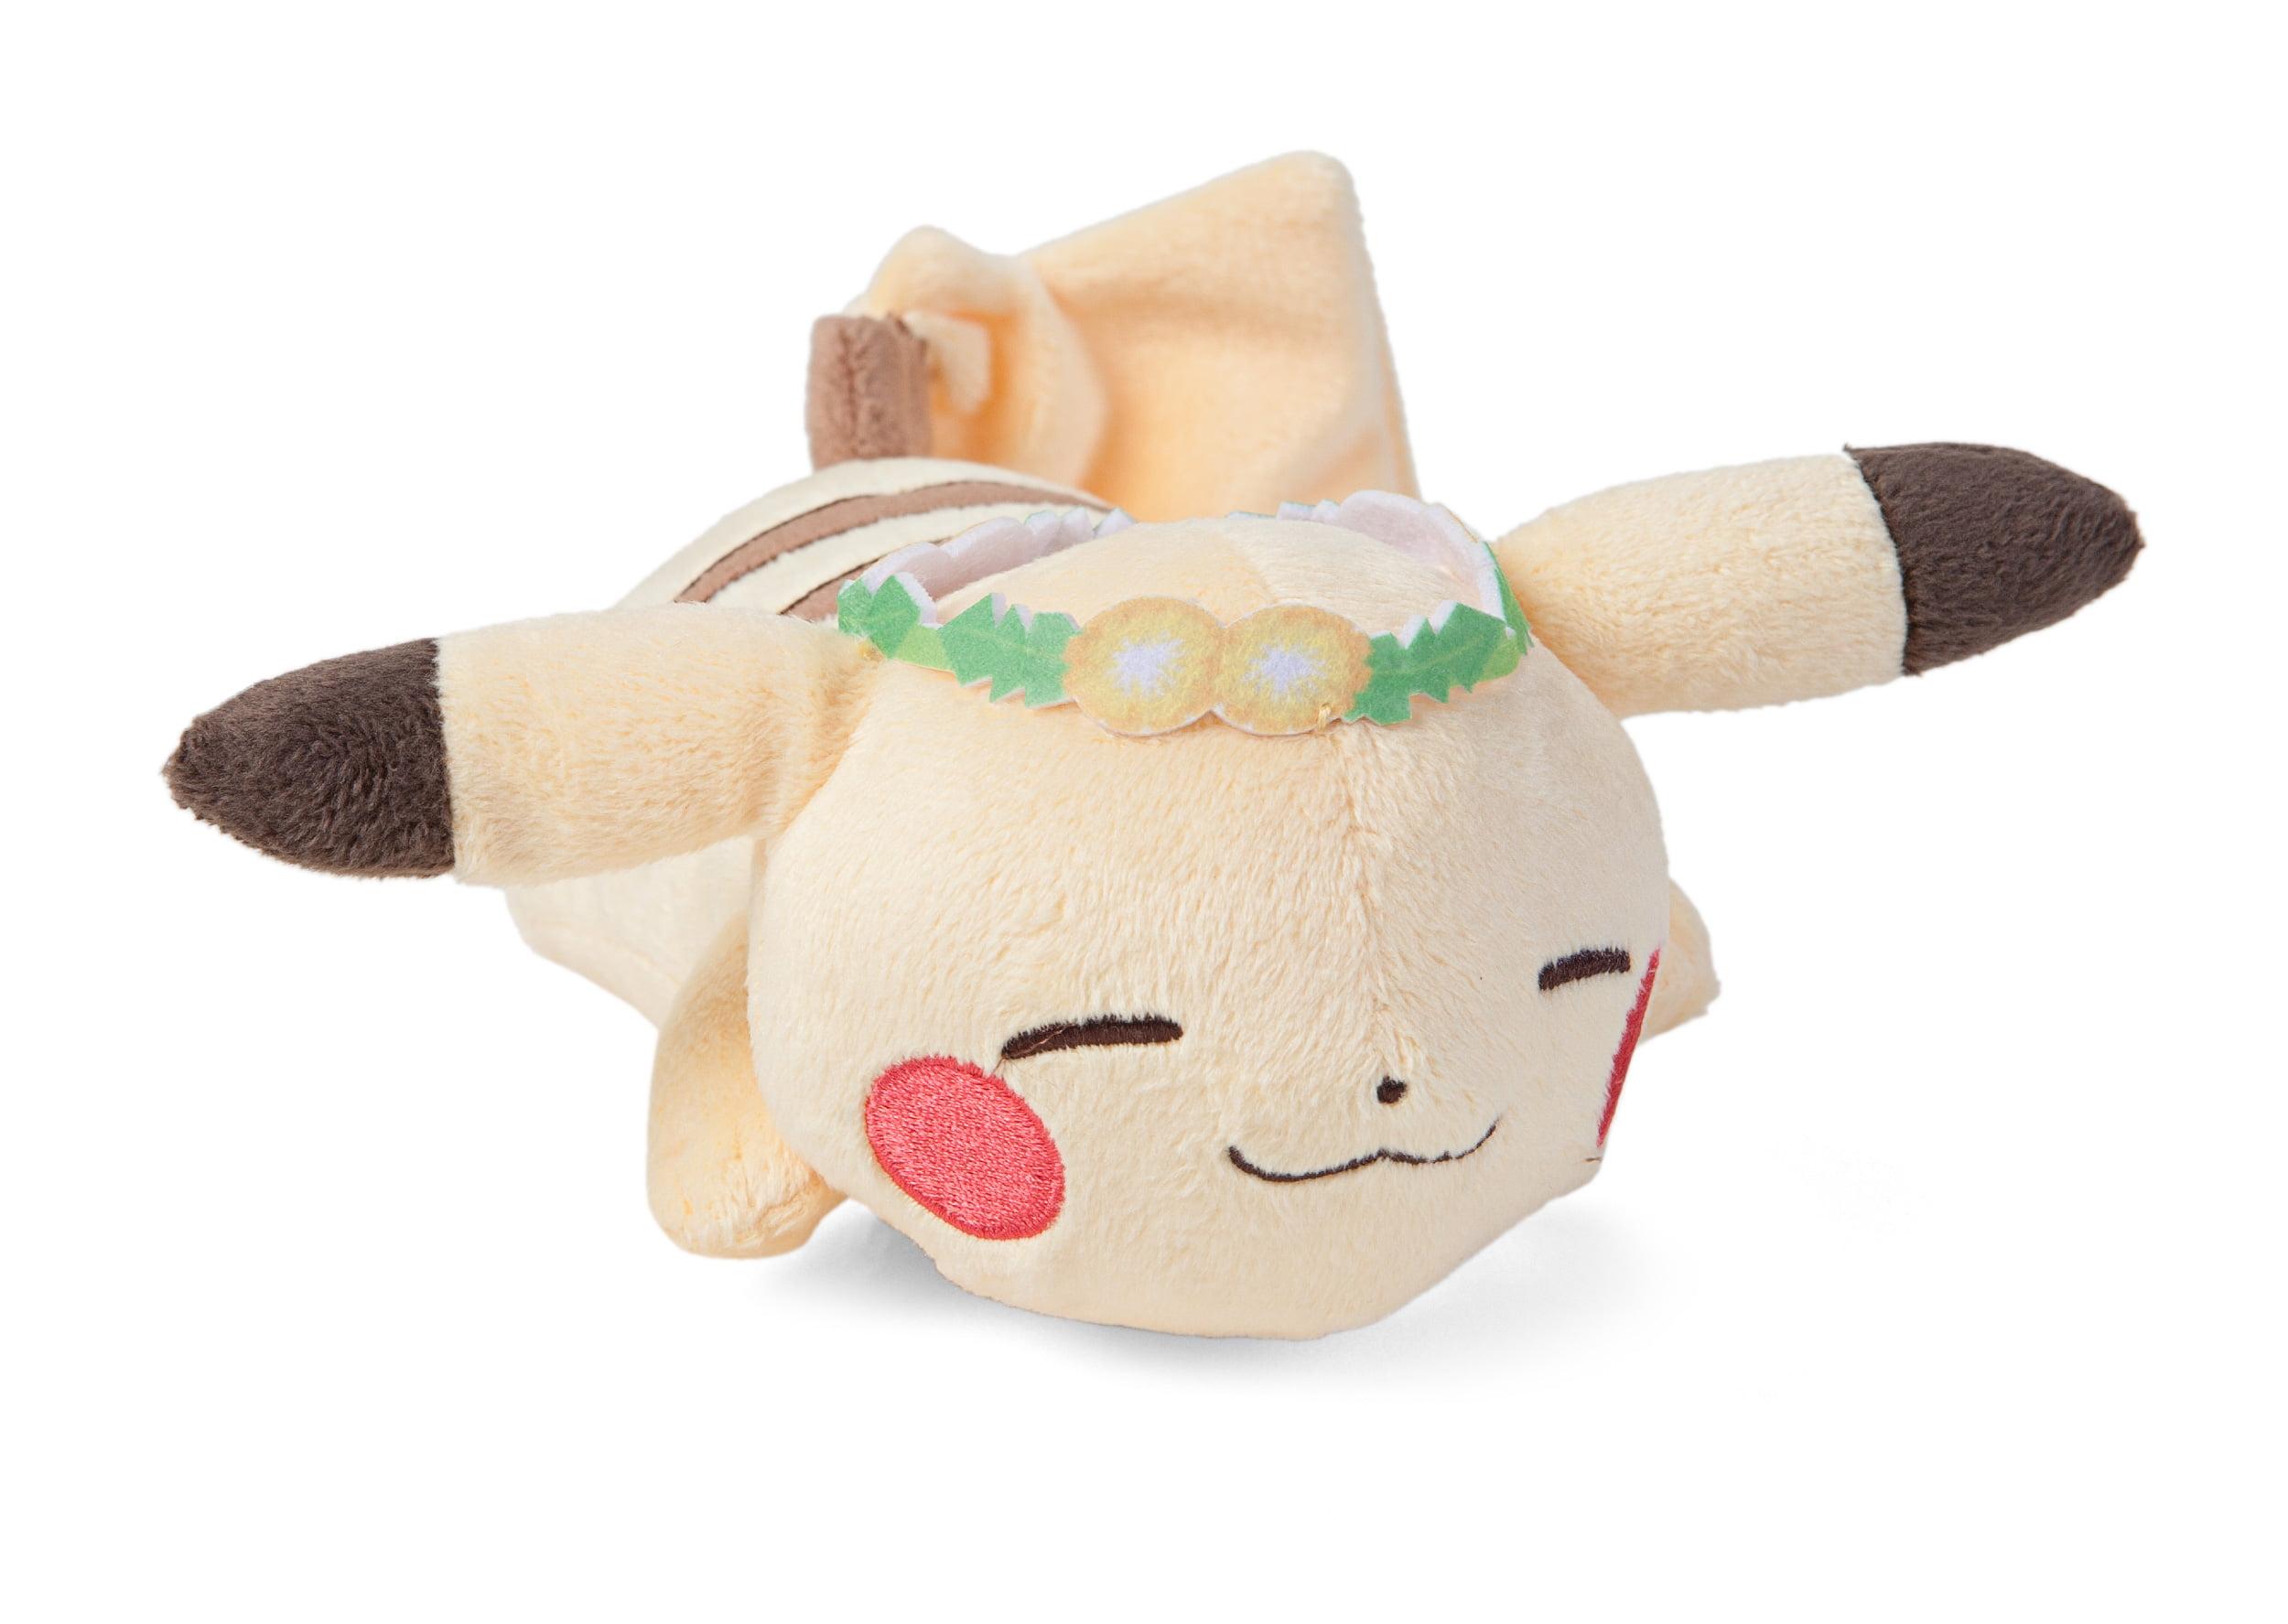 Pokemon Life Picnic Pikachu Sleeping with Crown 15 cm Plush Toy